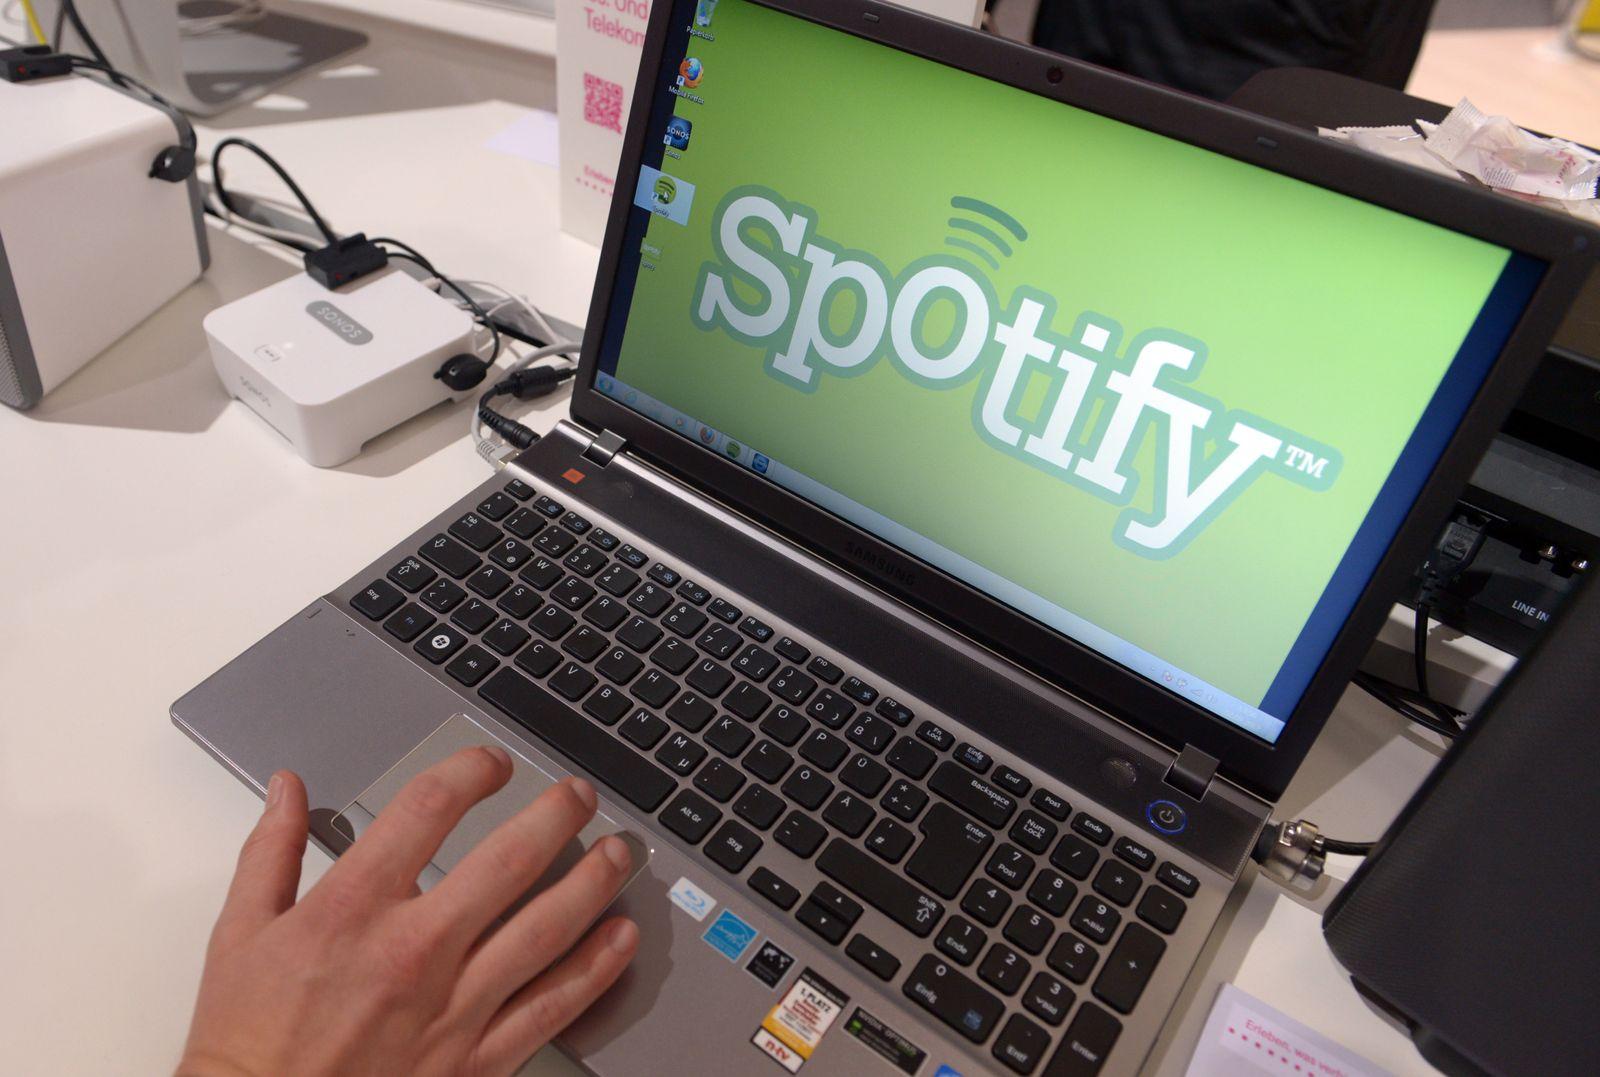 Spotify am Laptop / Musikstreaming